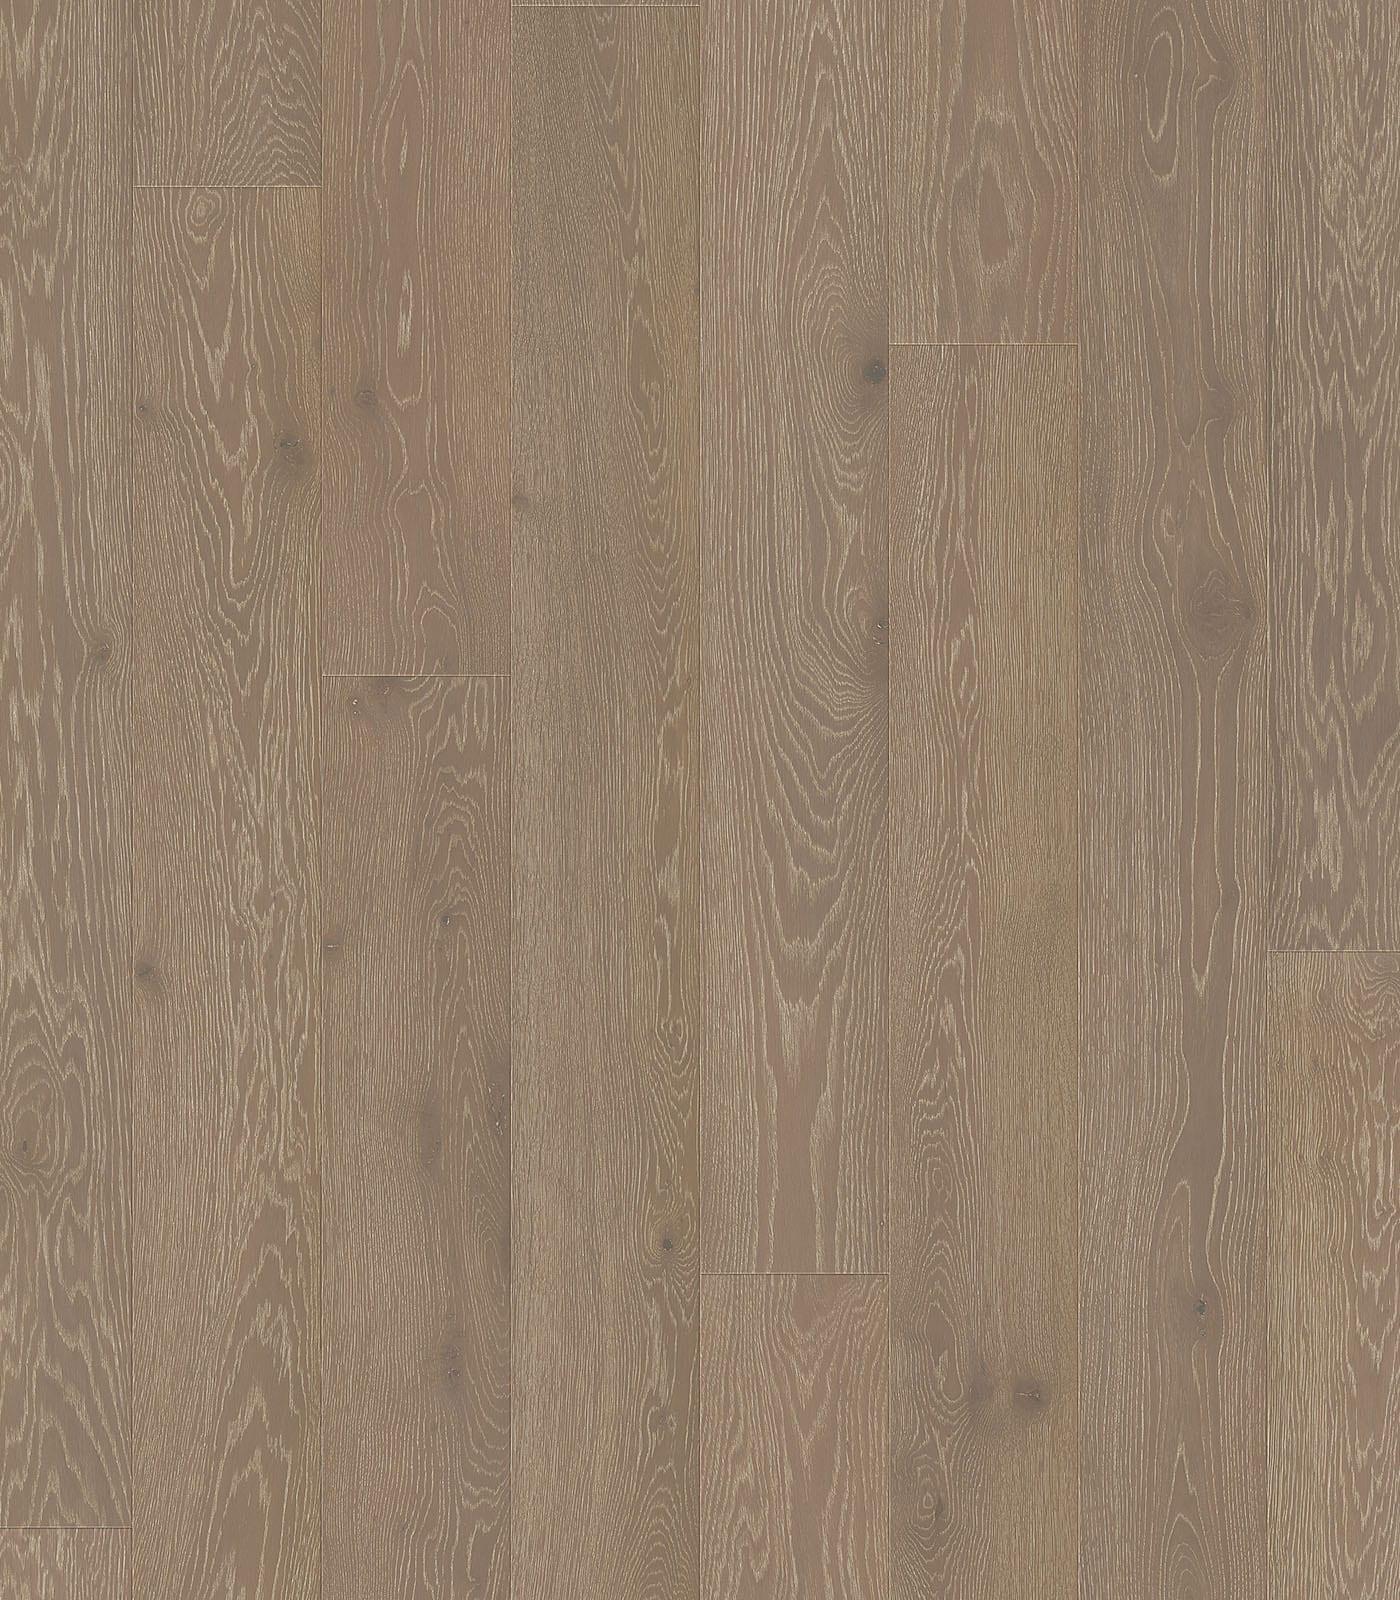 Tenne-Colors Collection-European Oak Floors-flat